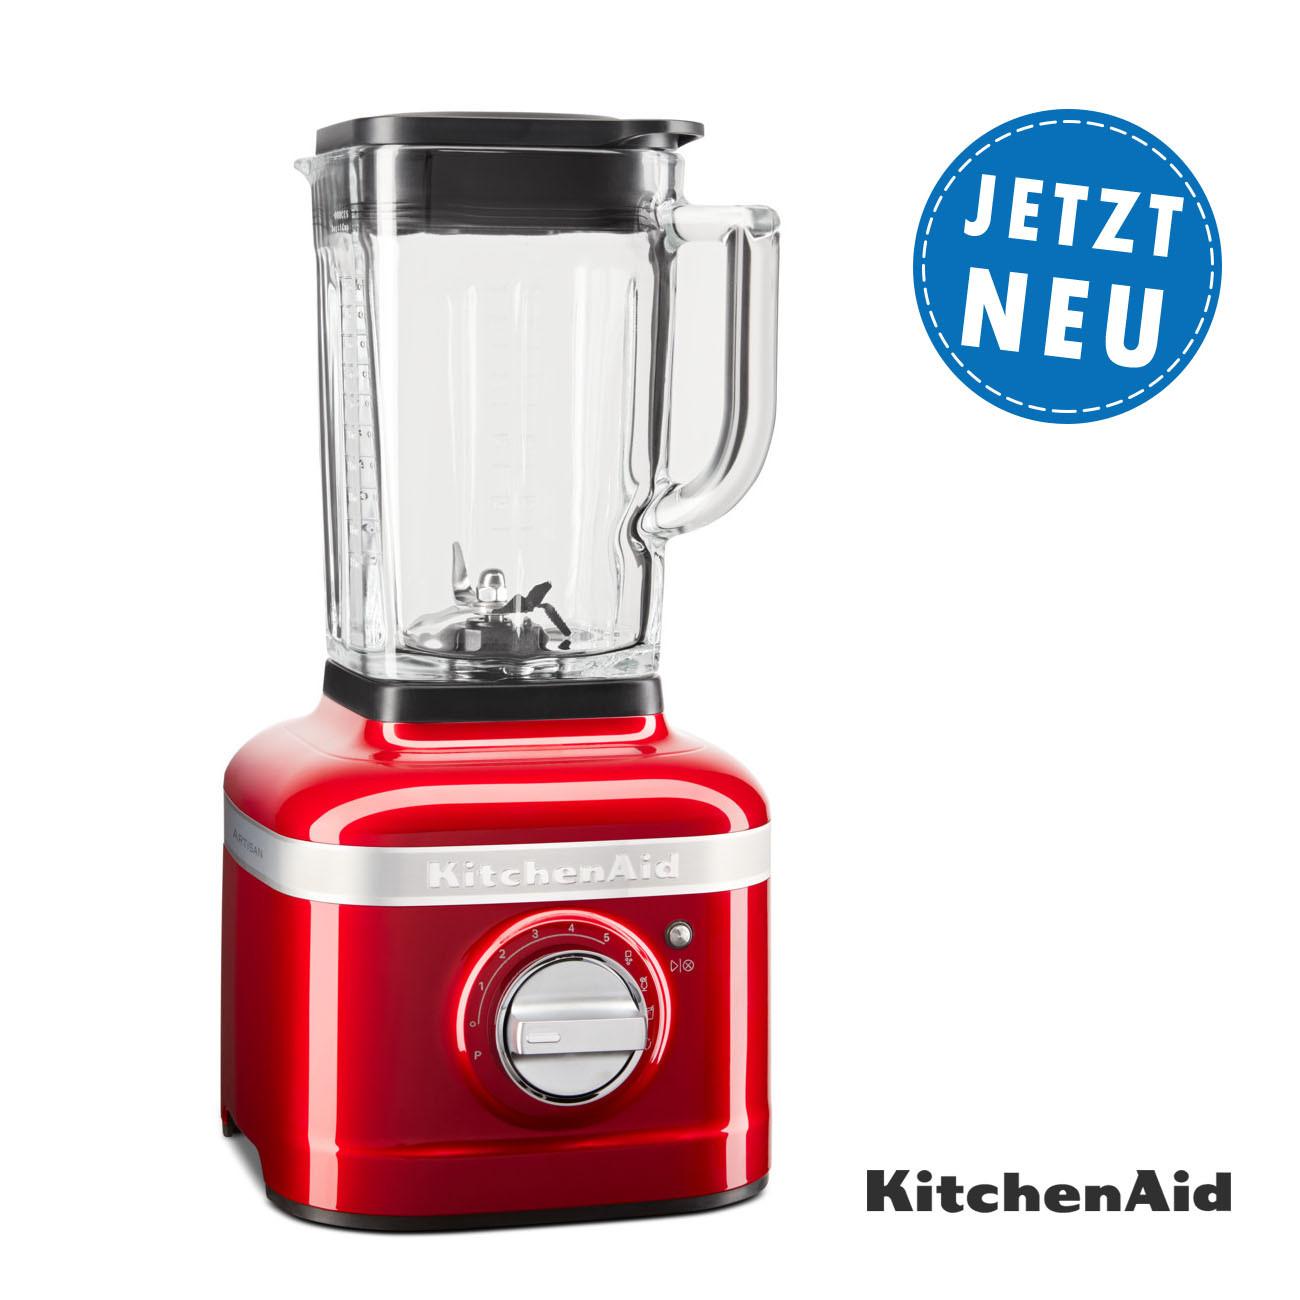 KitchenAid ARTISAN K400 Standmixer 5KSB4026 liebesapfelrot